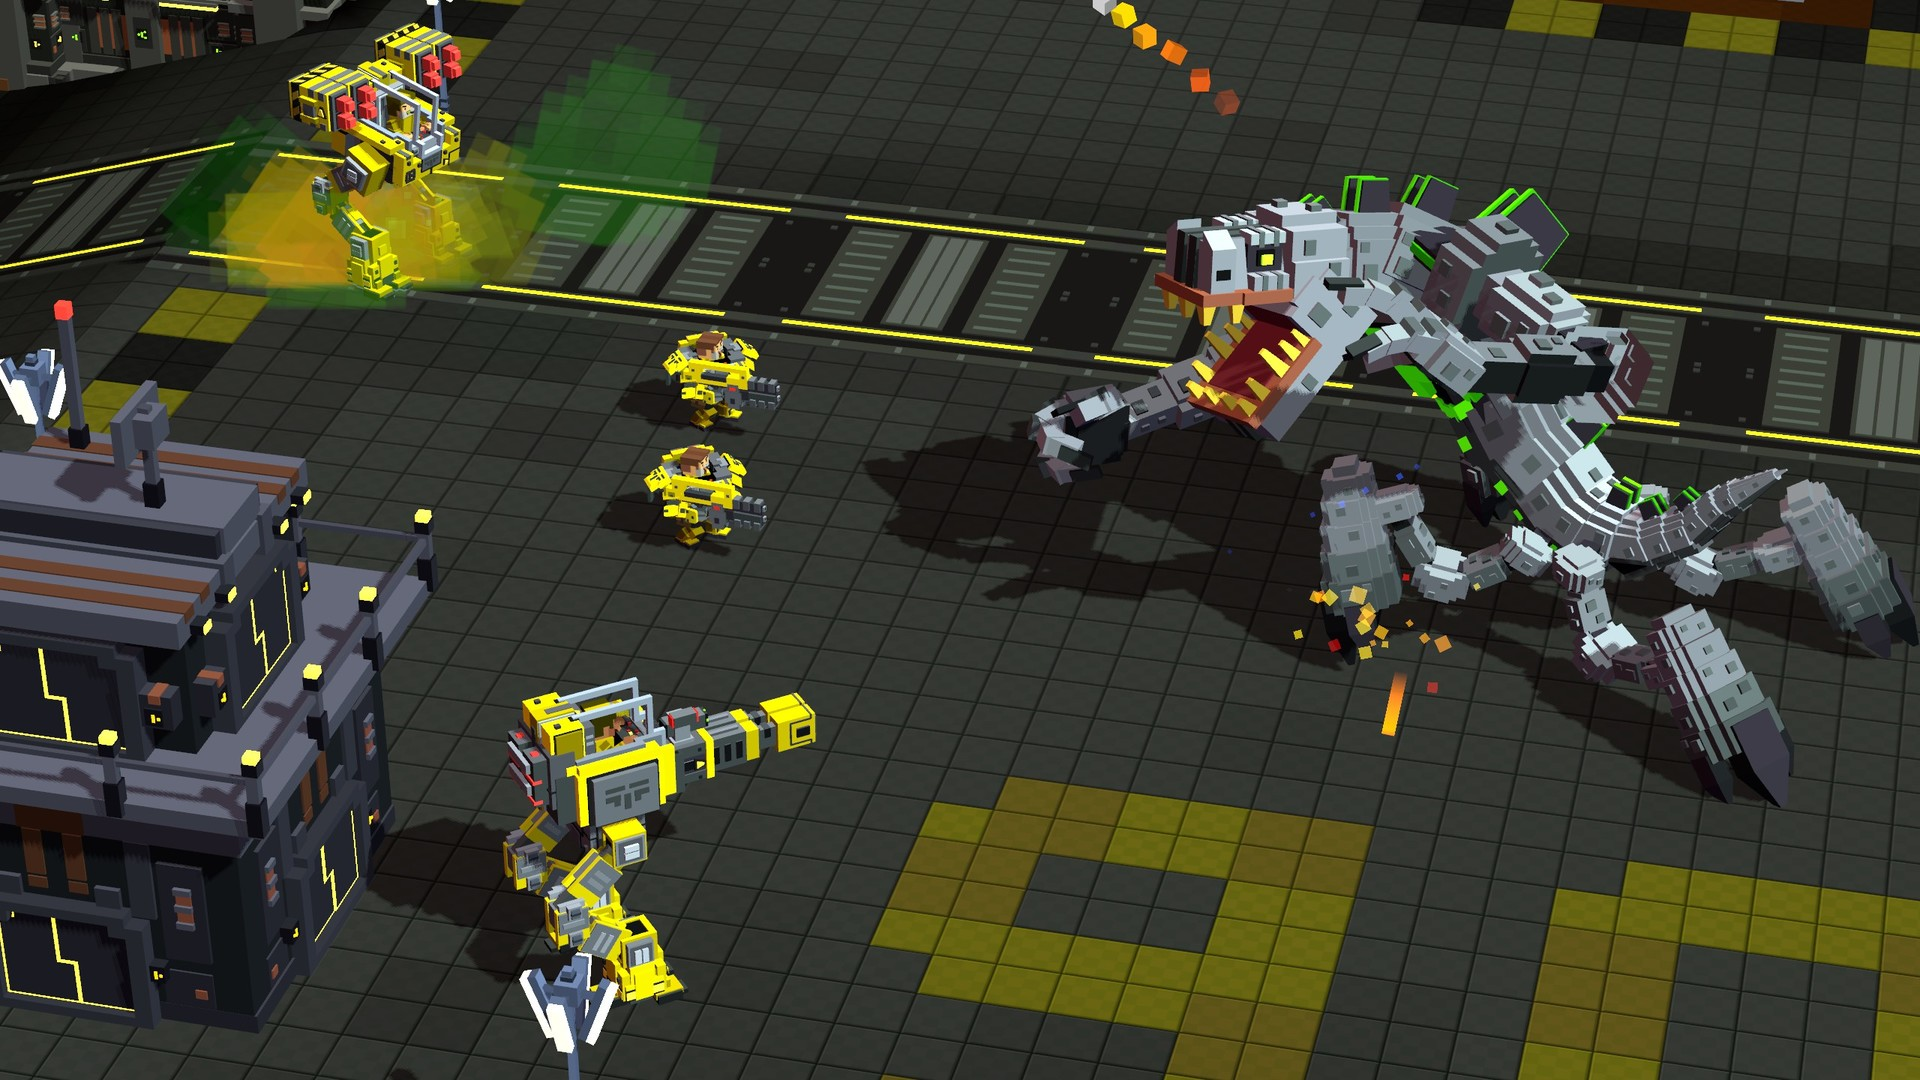 8 Bit Invaders Screenshot 3